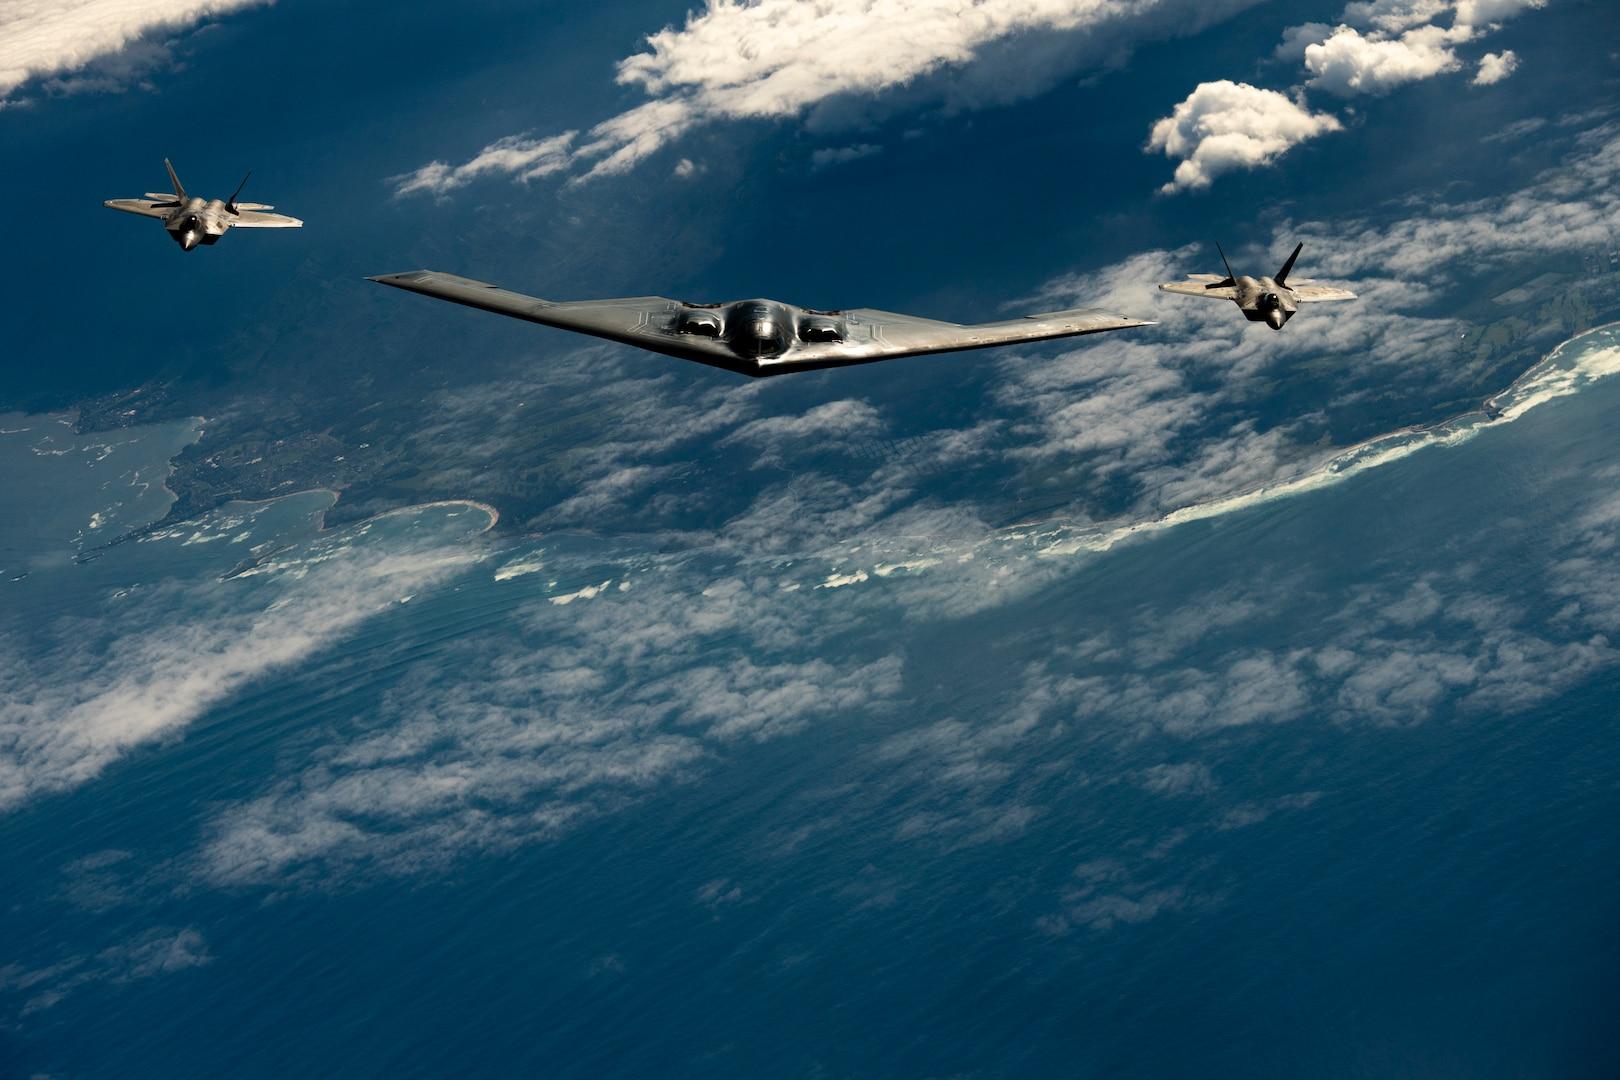 Mission complete: Spirits return to Missouri after BTF rotation